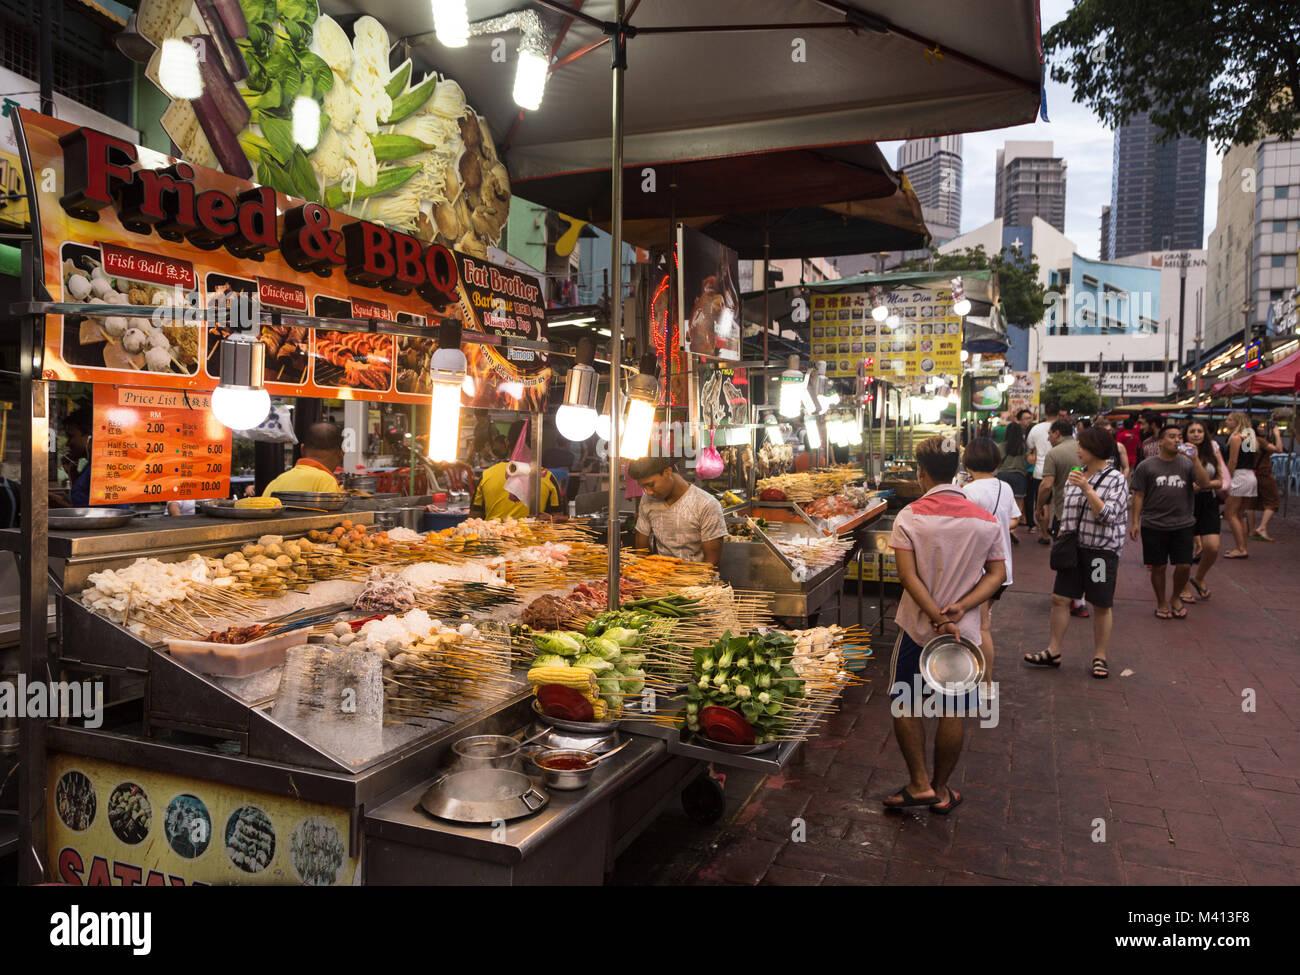 Kuala Lumpur, Malaysia - 22. Dezember 2017: Touristen und Einheimische wandern an der Jalan Alor berühmt für Stockbild